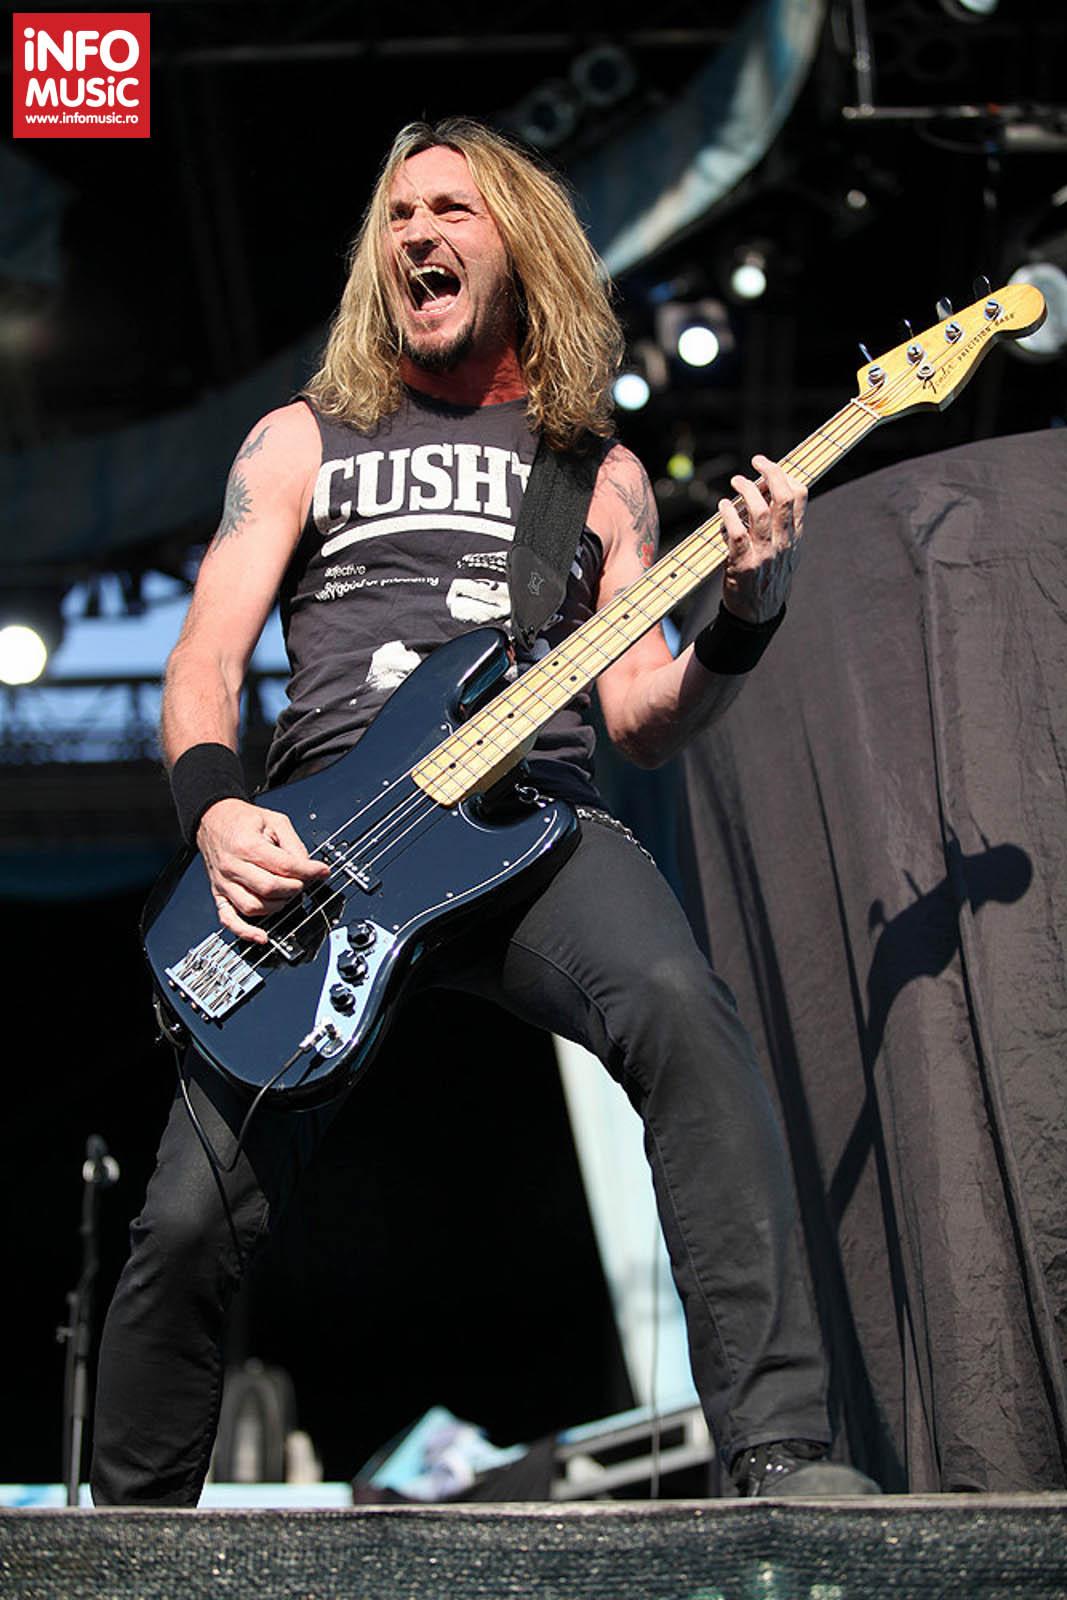 Voodoo Six in deschiderea concertului Iron Maiden din Piata Constitutiei pe 24 iulie 2013